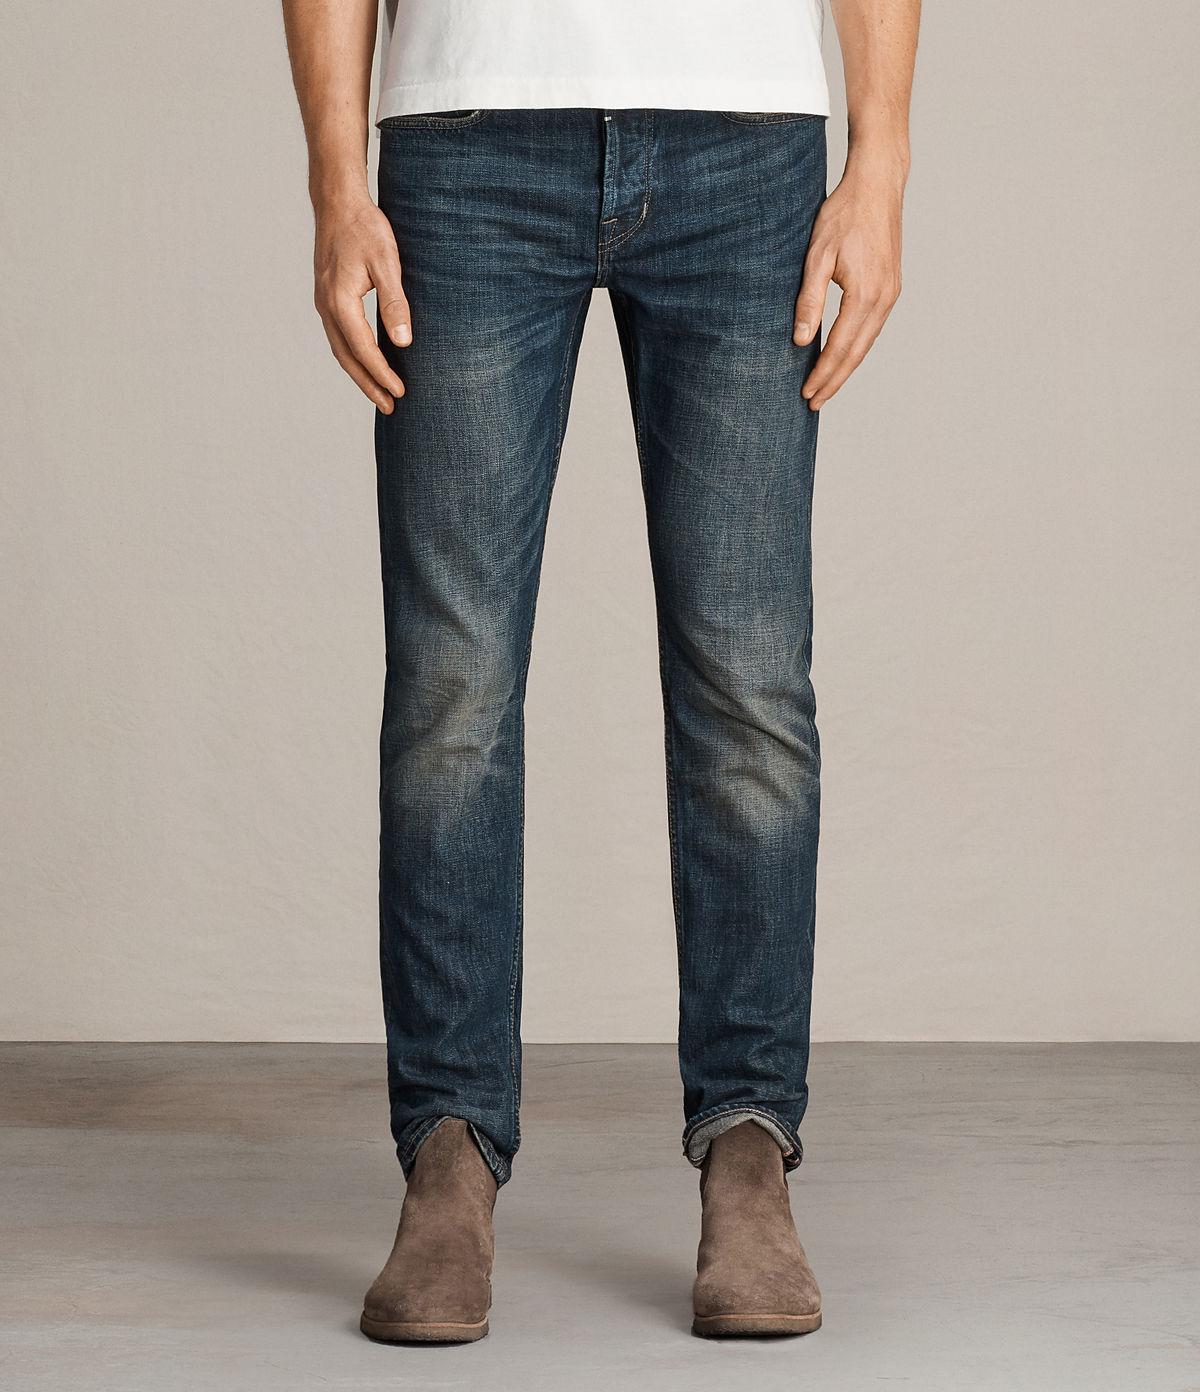 amori-iggy-jeans